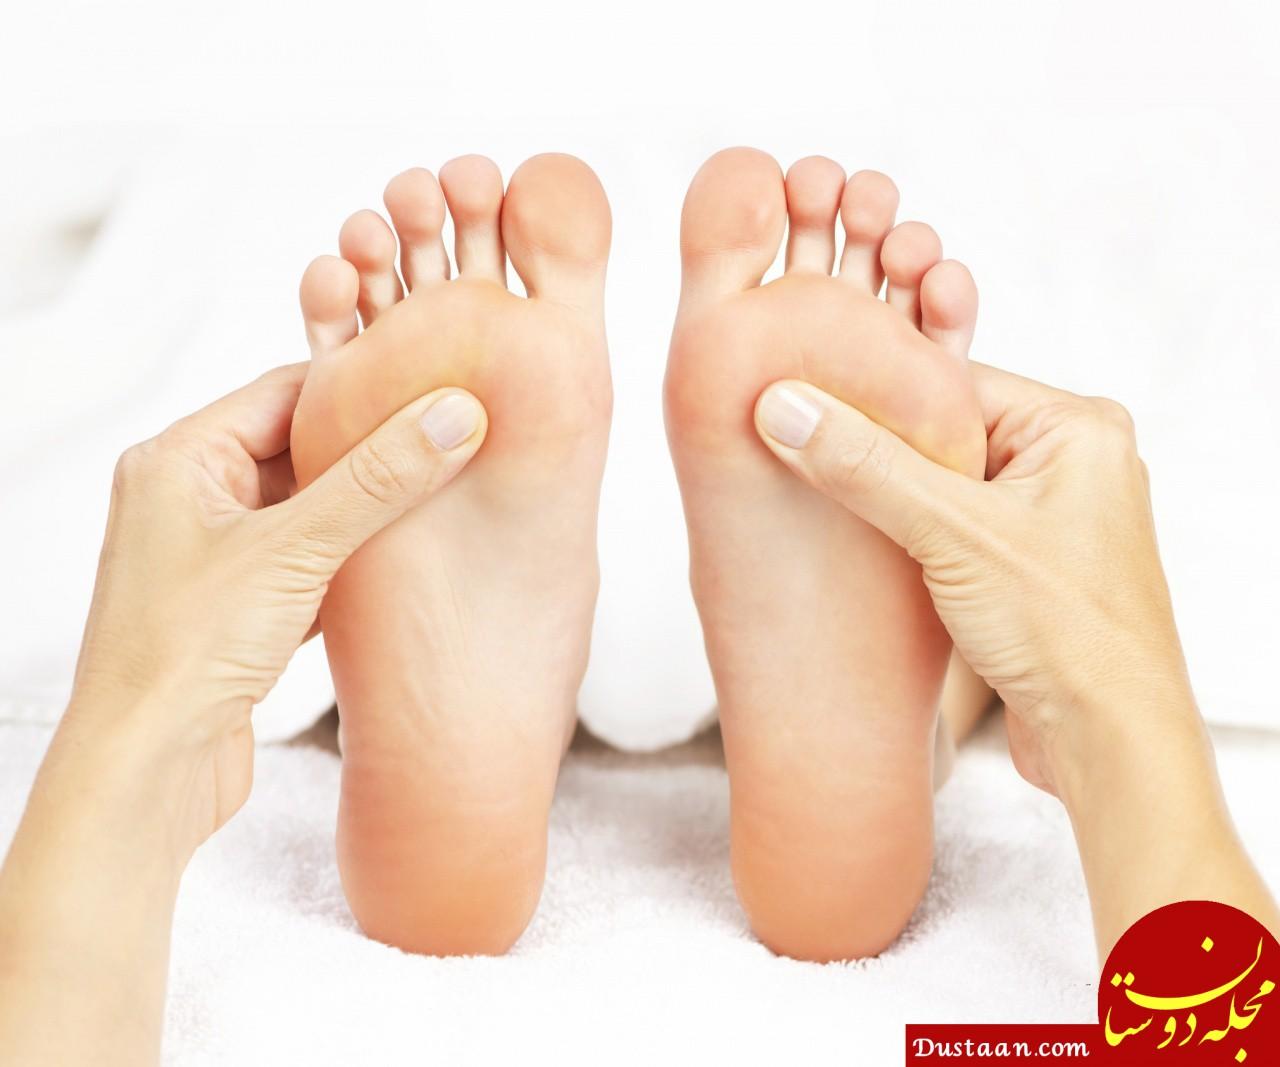 www.dustaan.com - زردی کف پا نشانه چه بیماری است؟